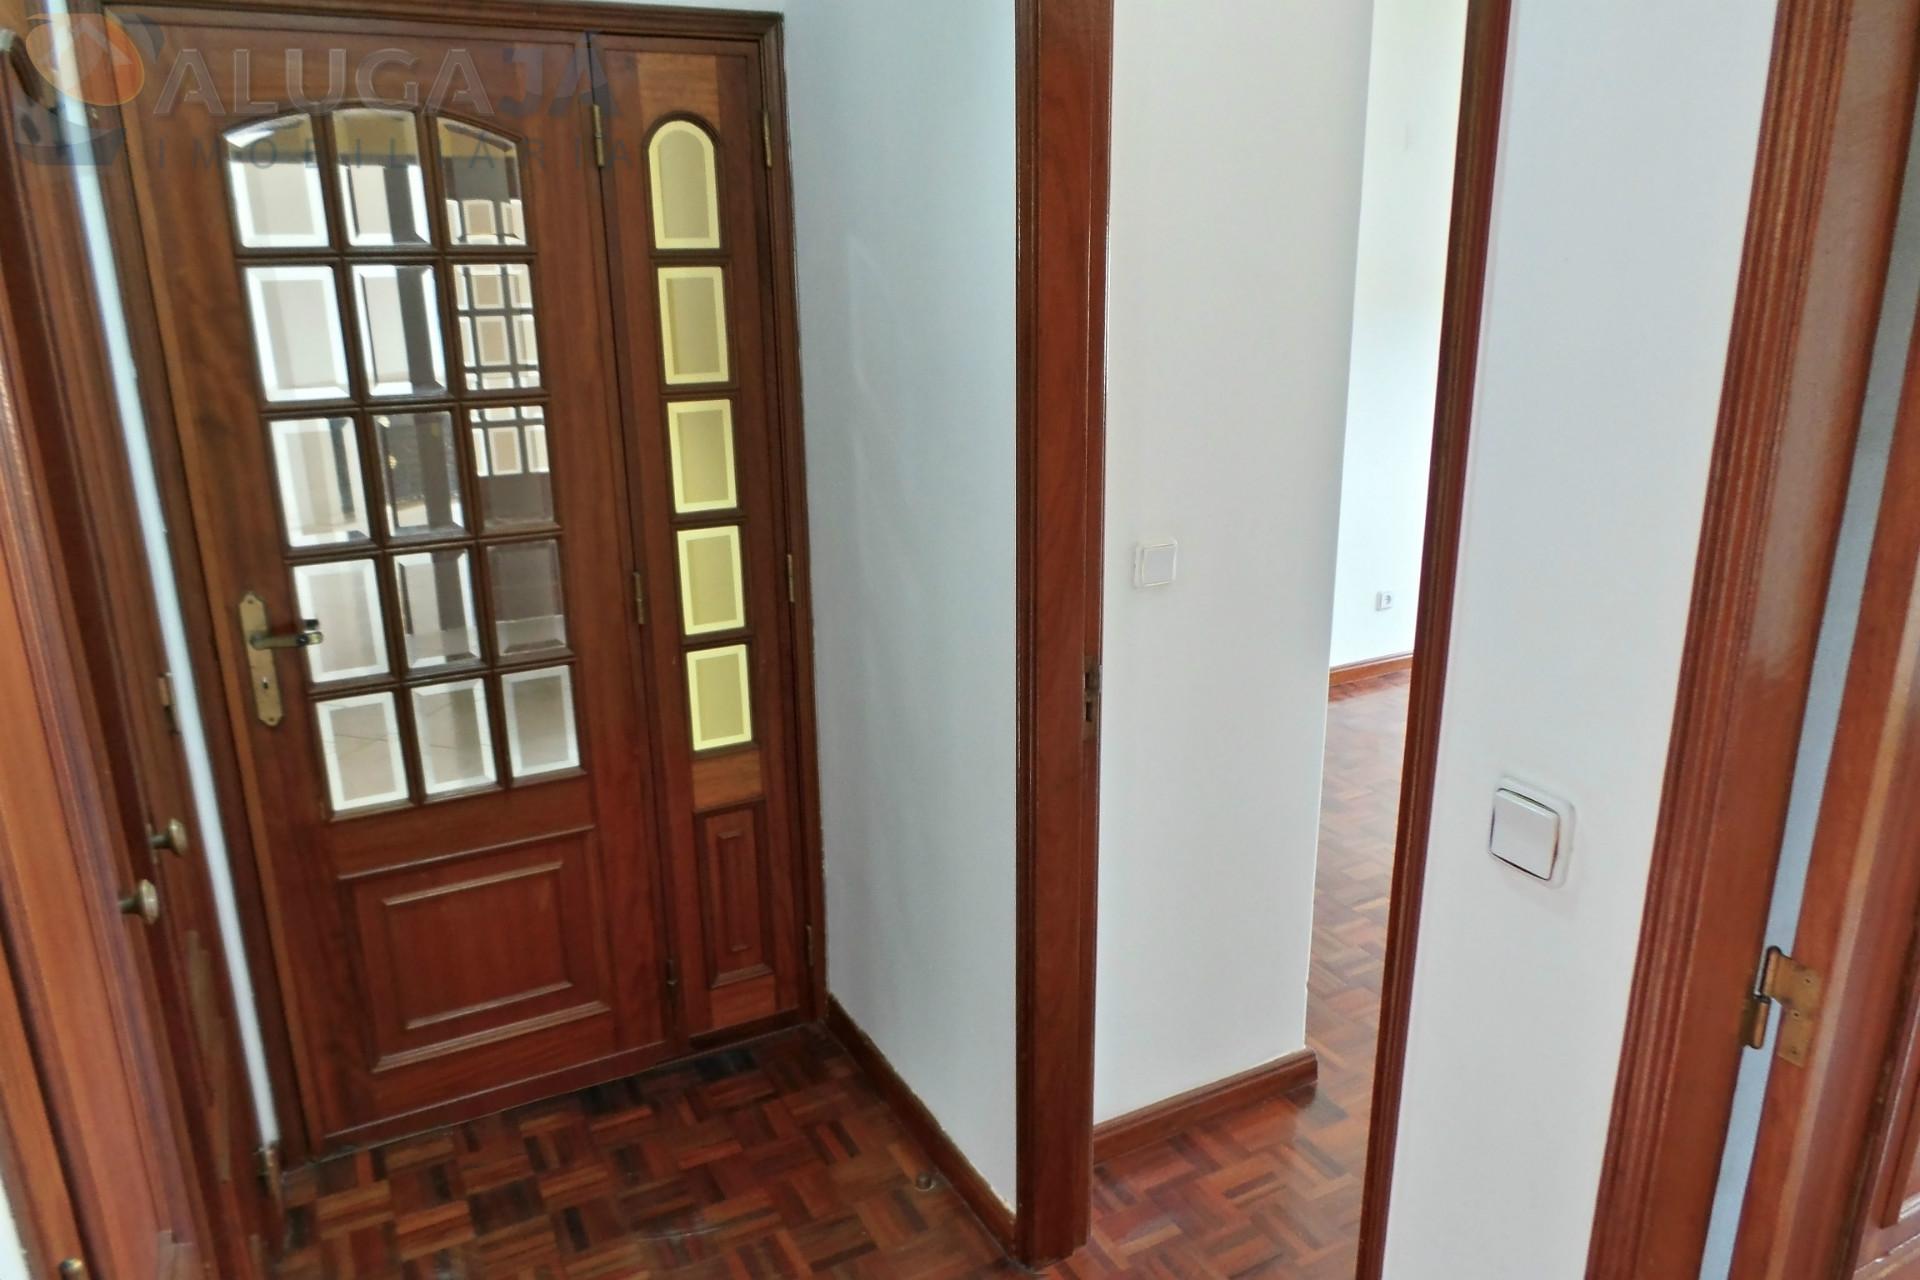 Chambres Hall